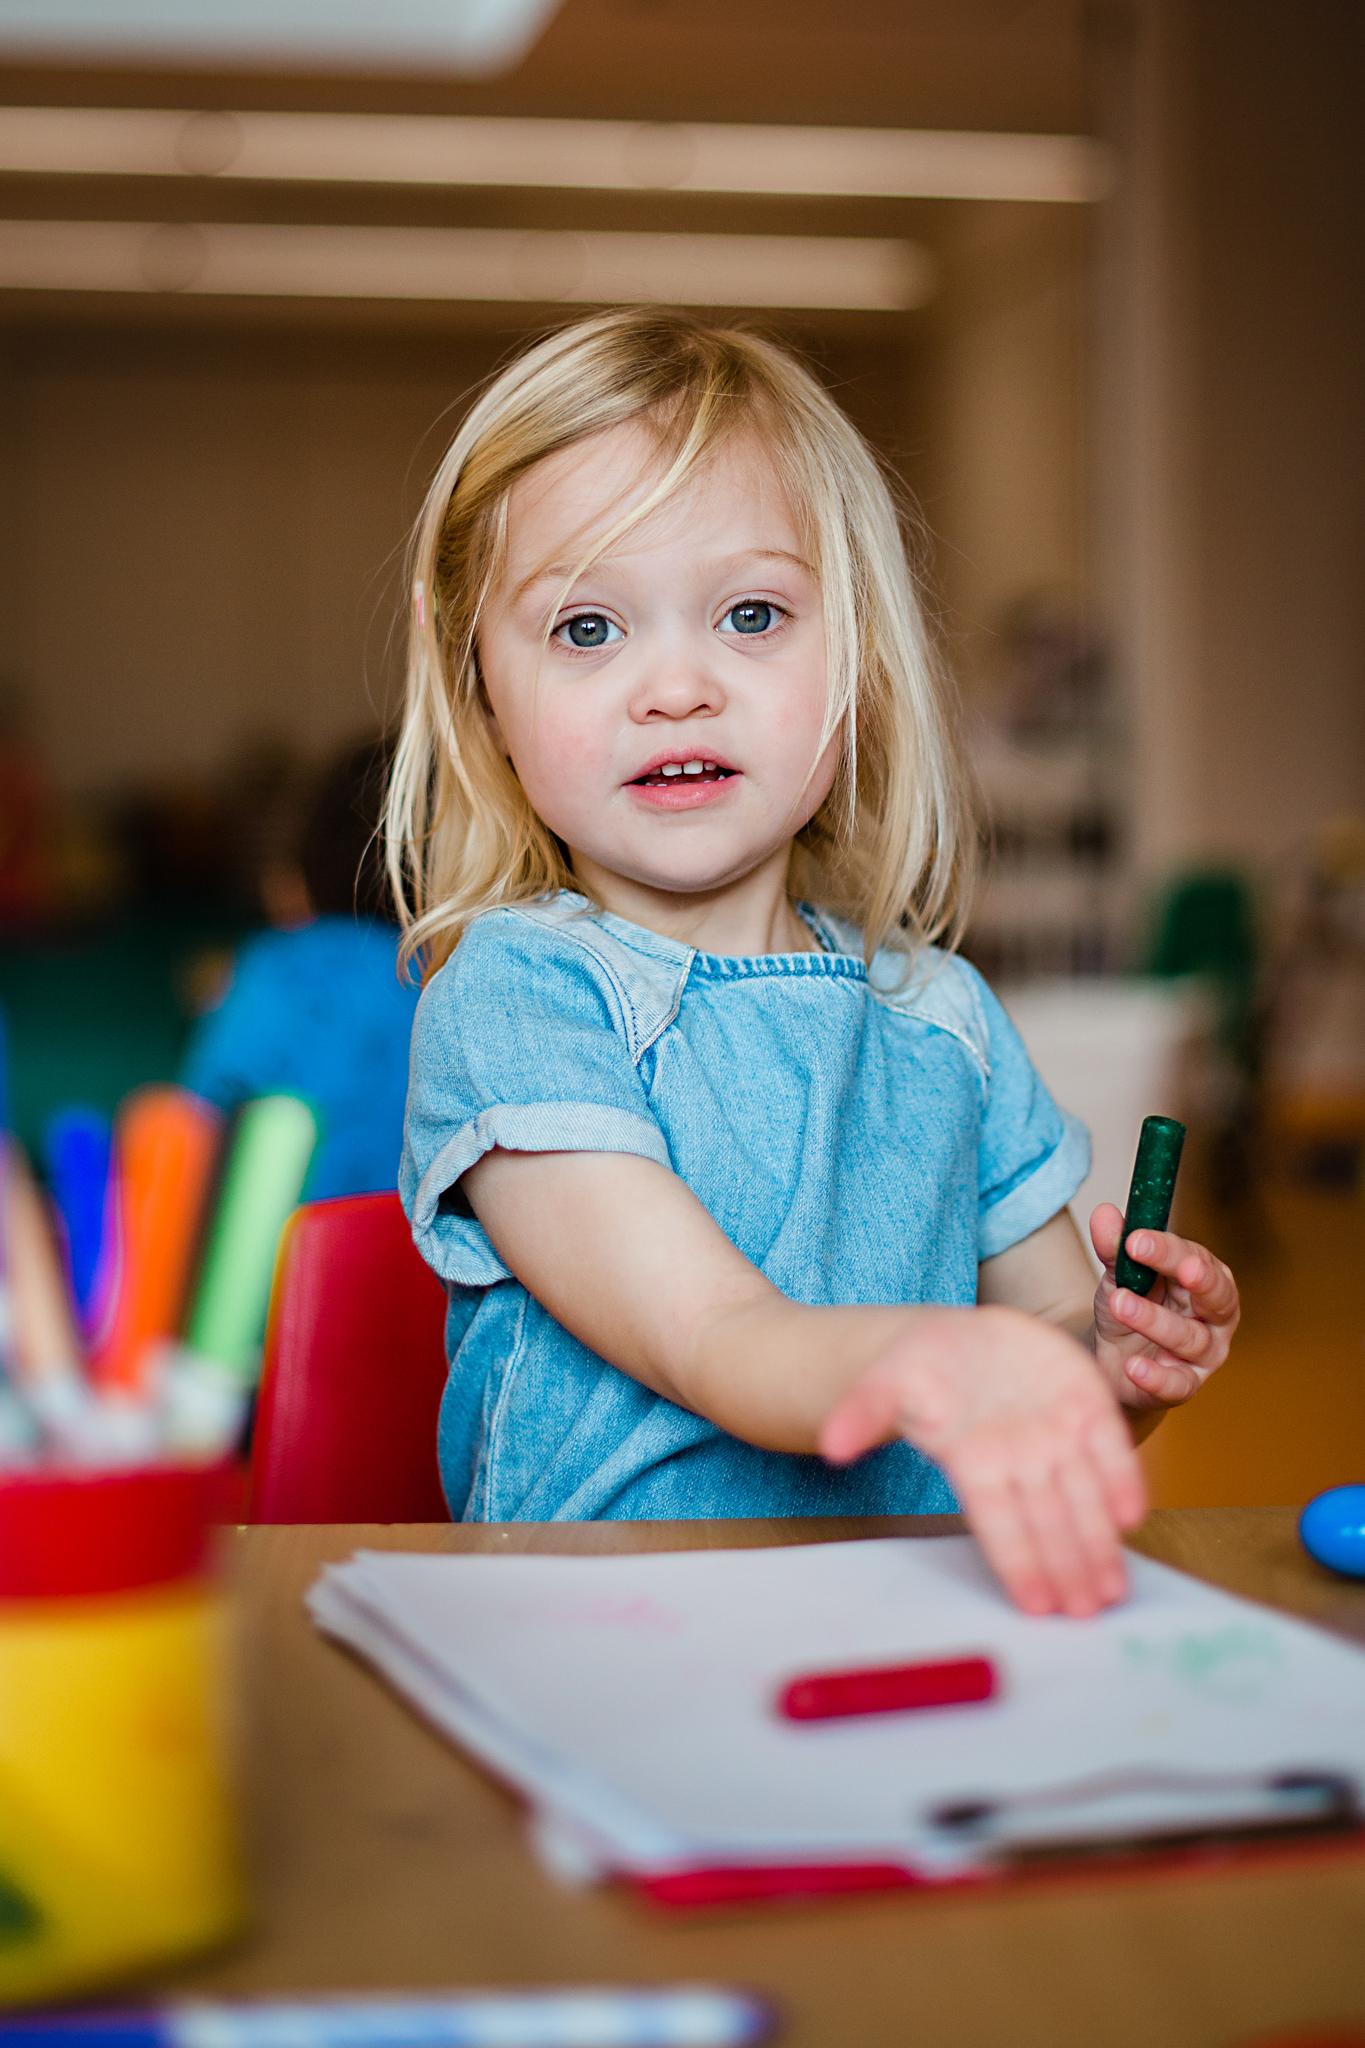 Bedford Family Photographer - Preschool Photos.jpg